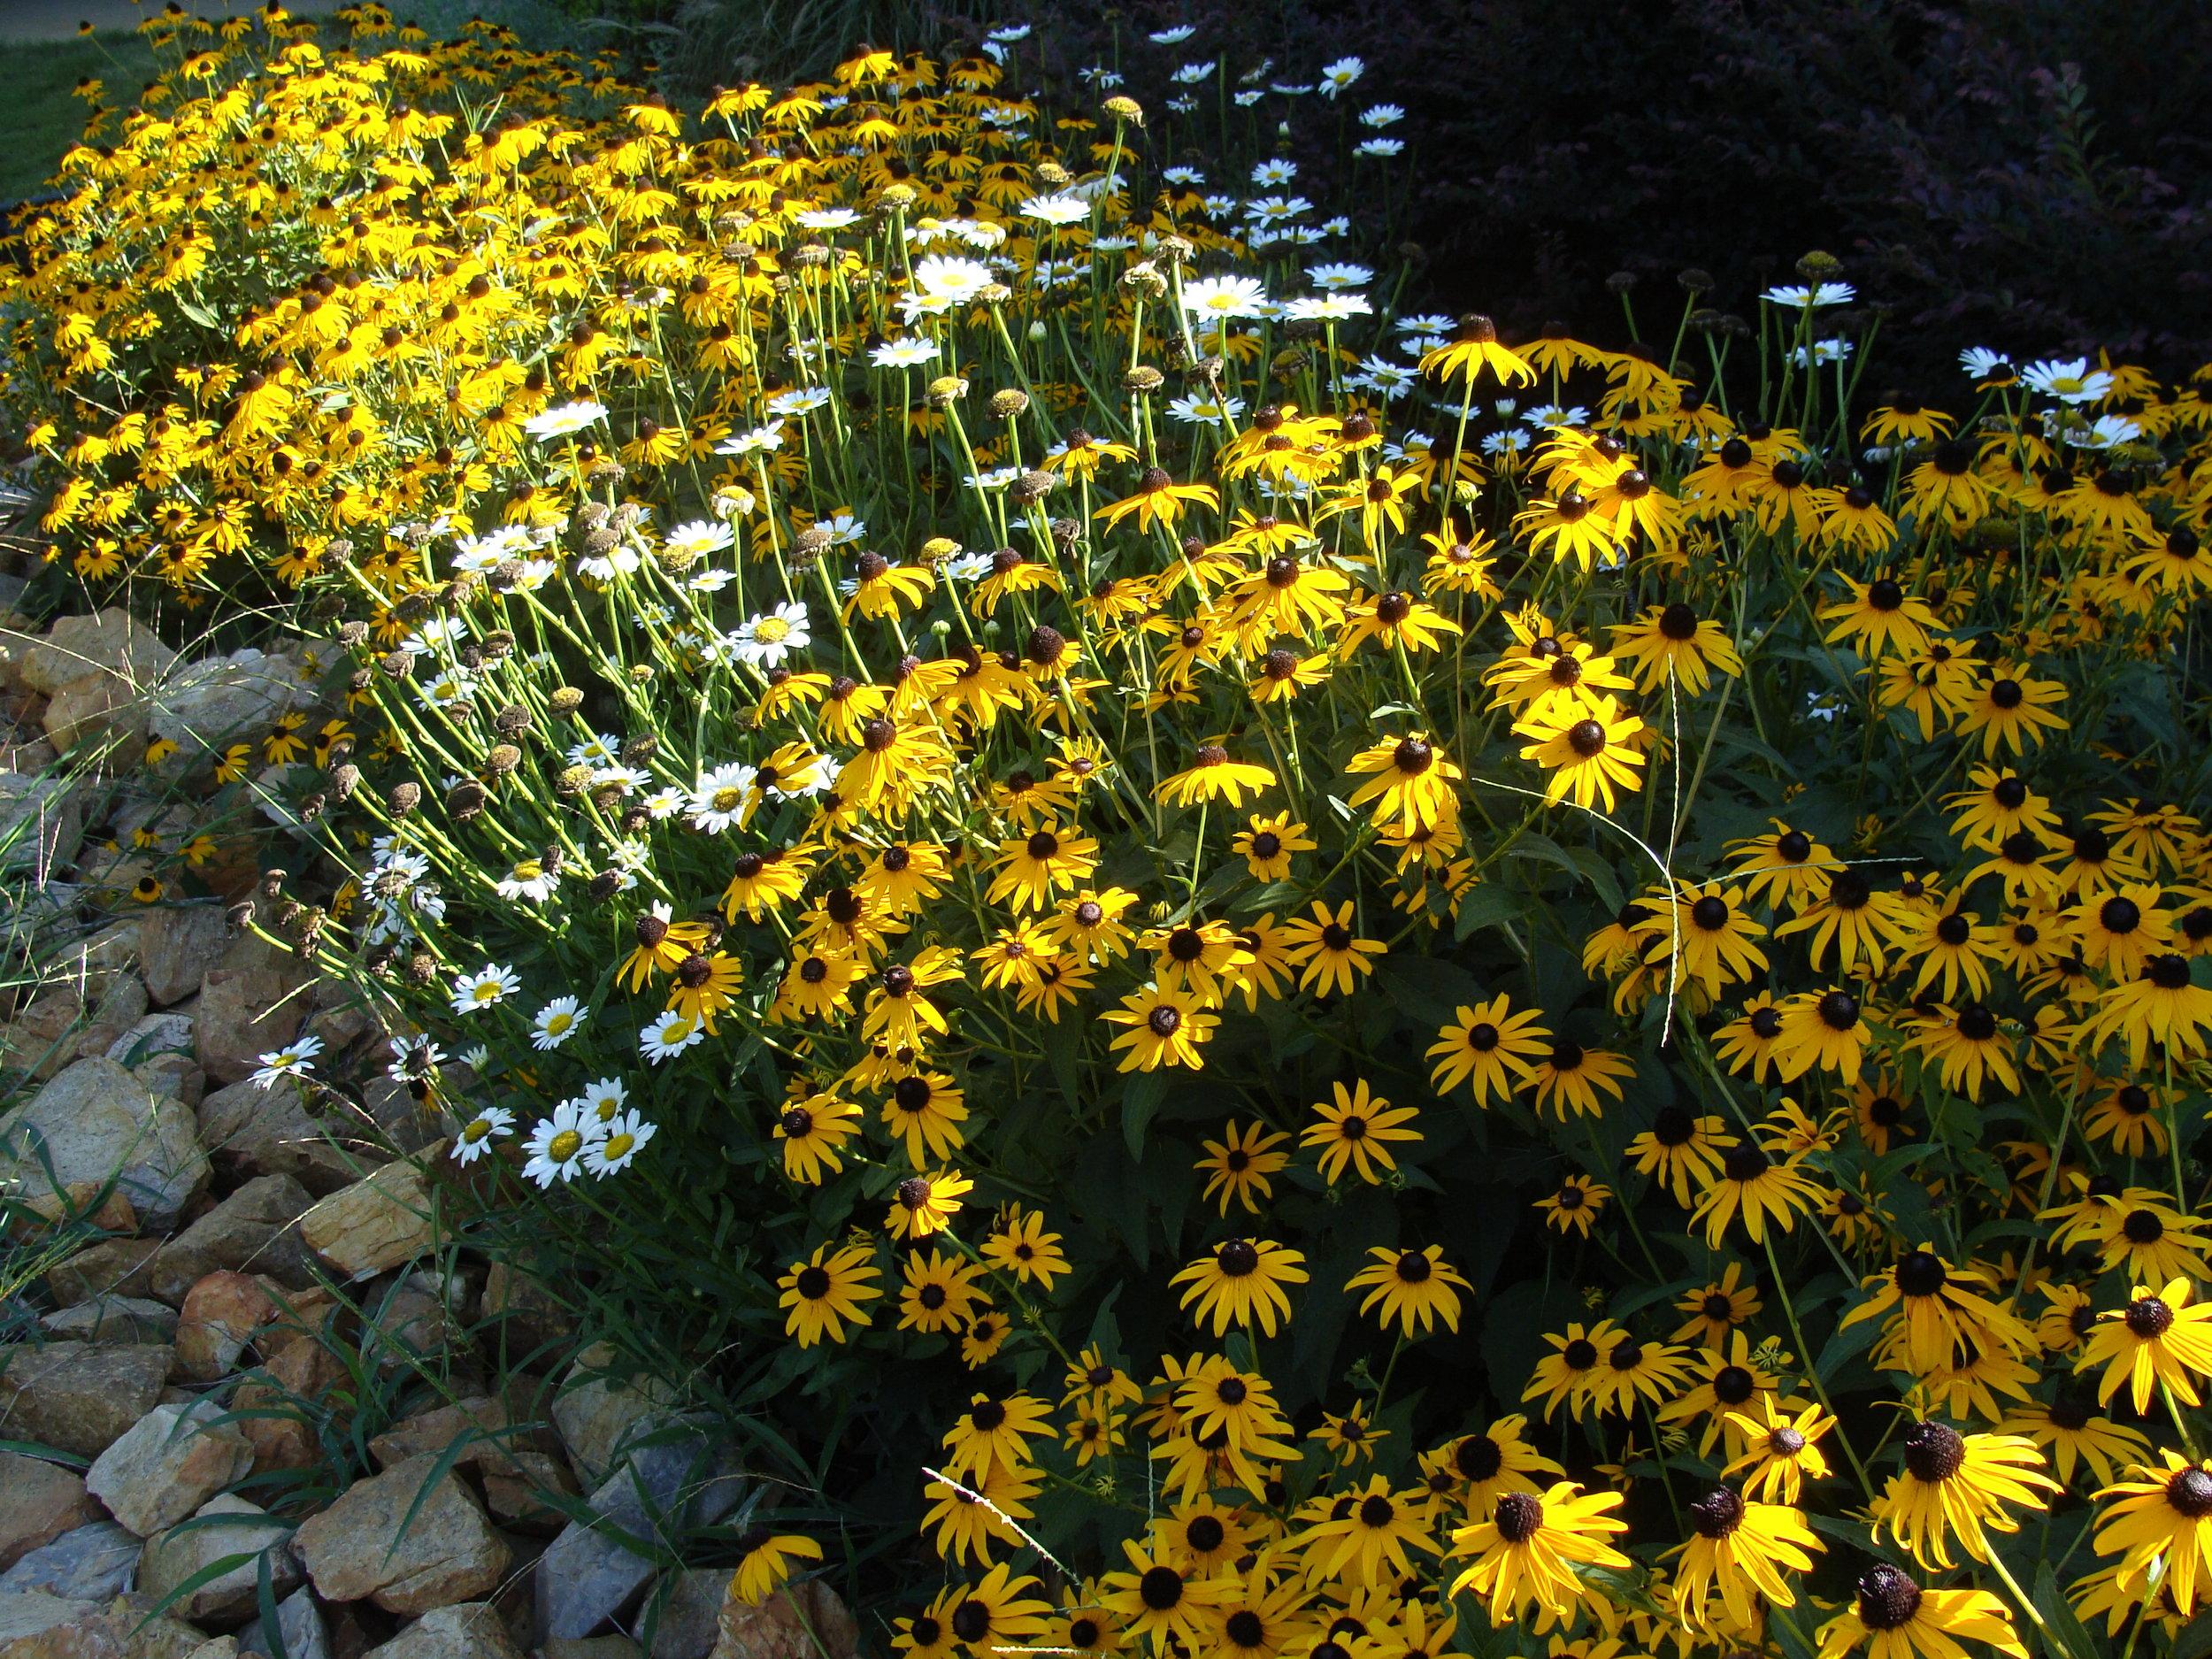 Rudbeckia hirta  (Black-Eyed Susan) and  Leucanthemum superbum  (Shasta Daisy)